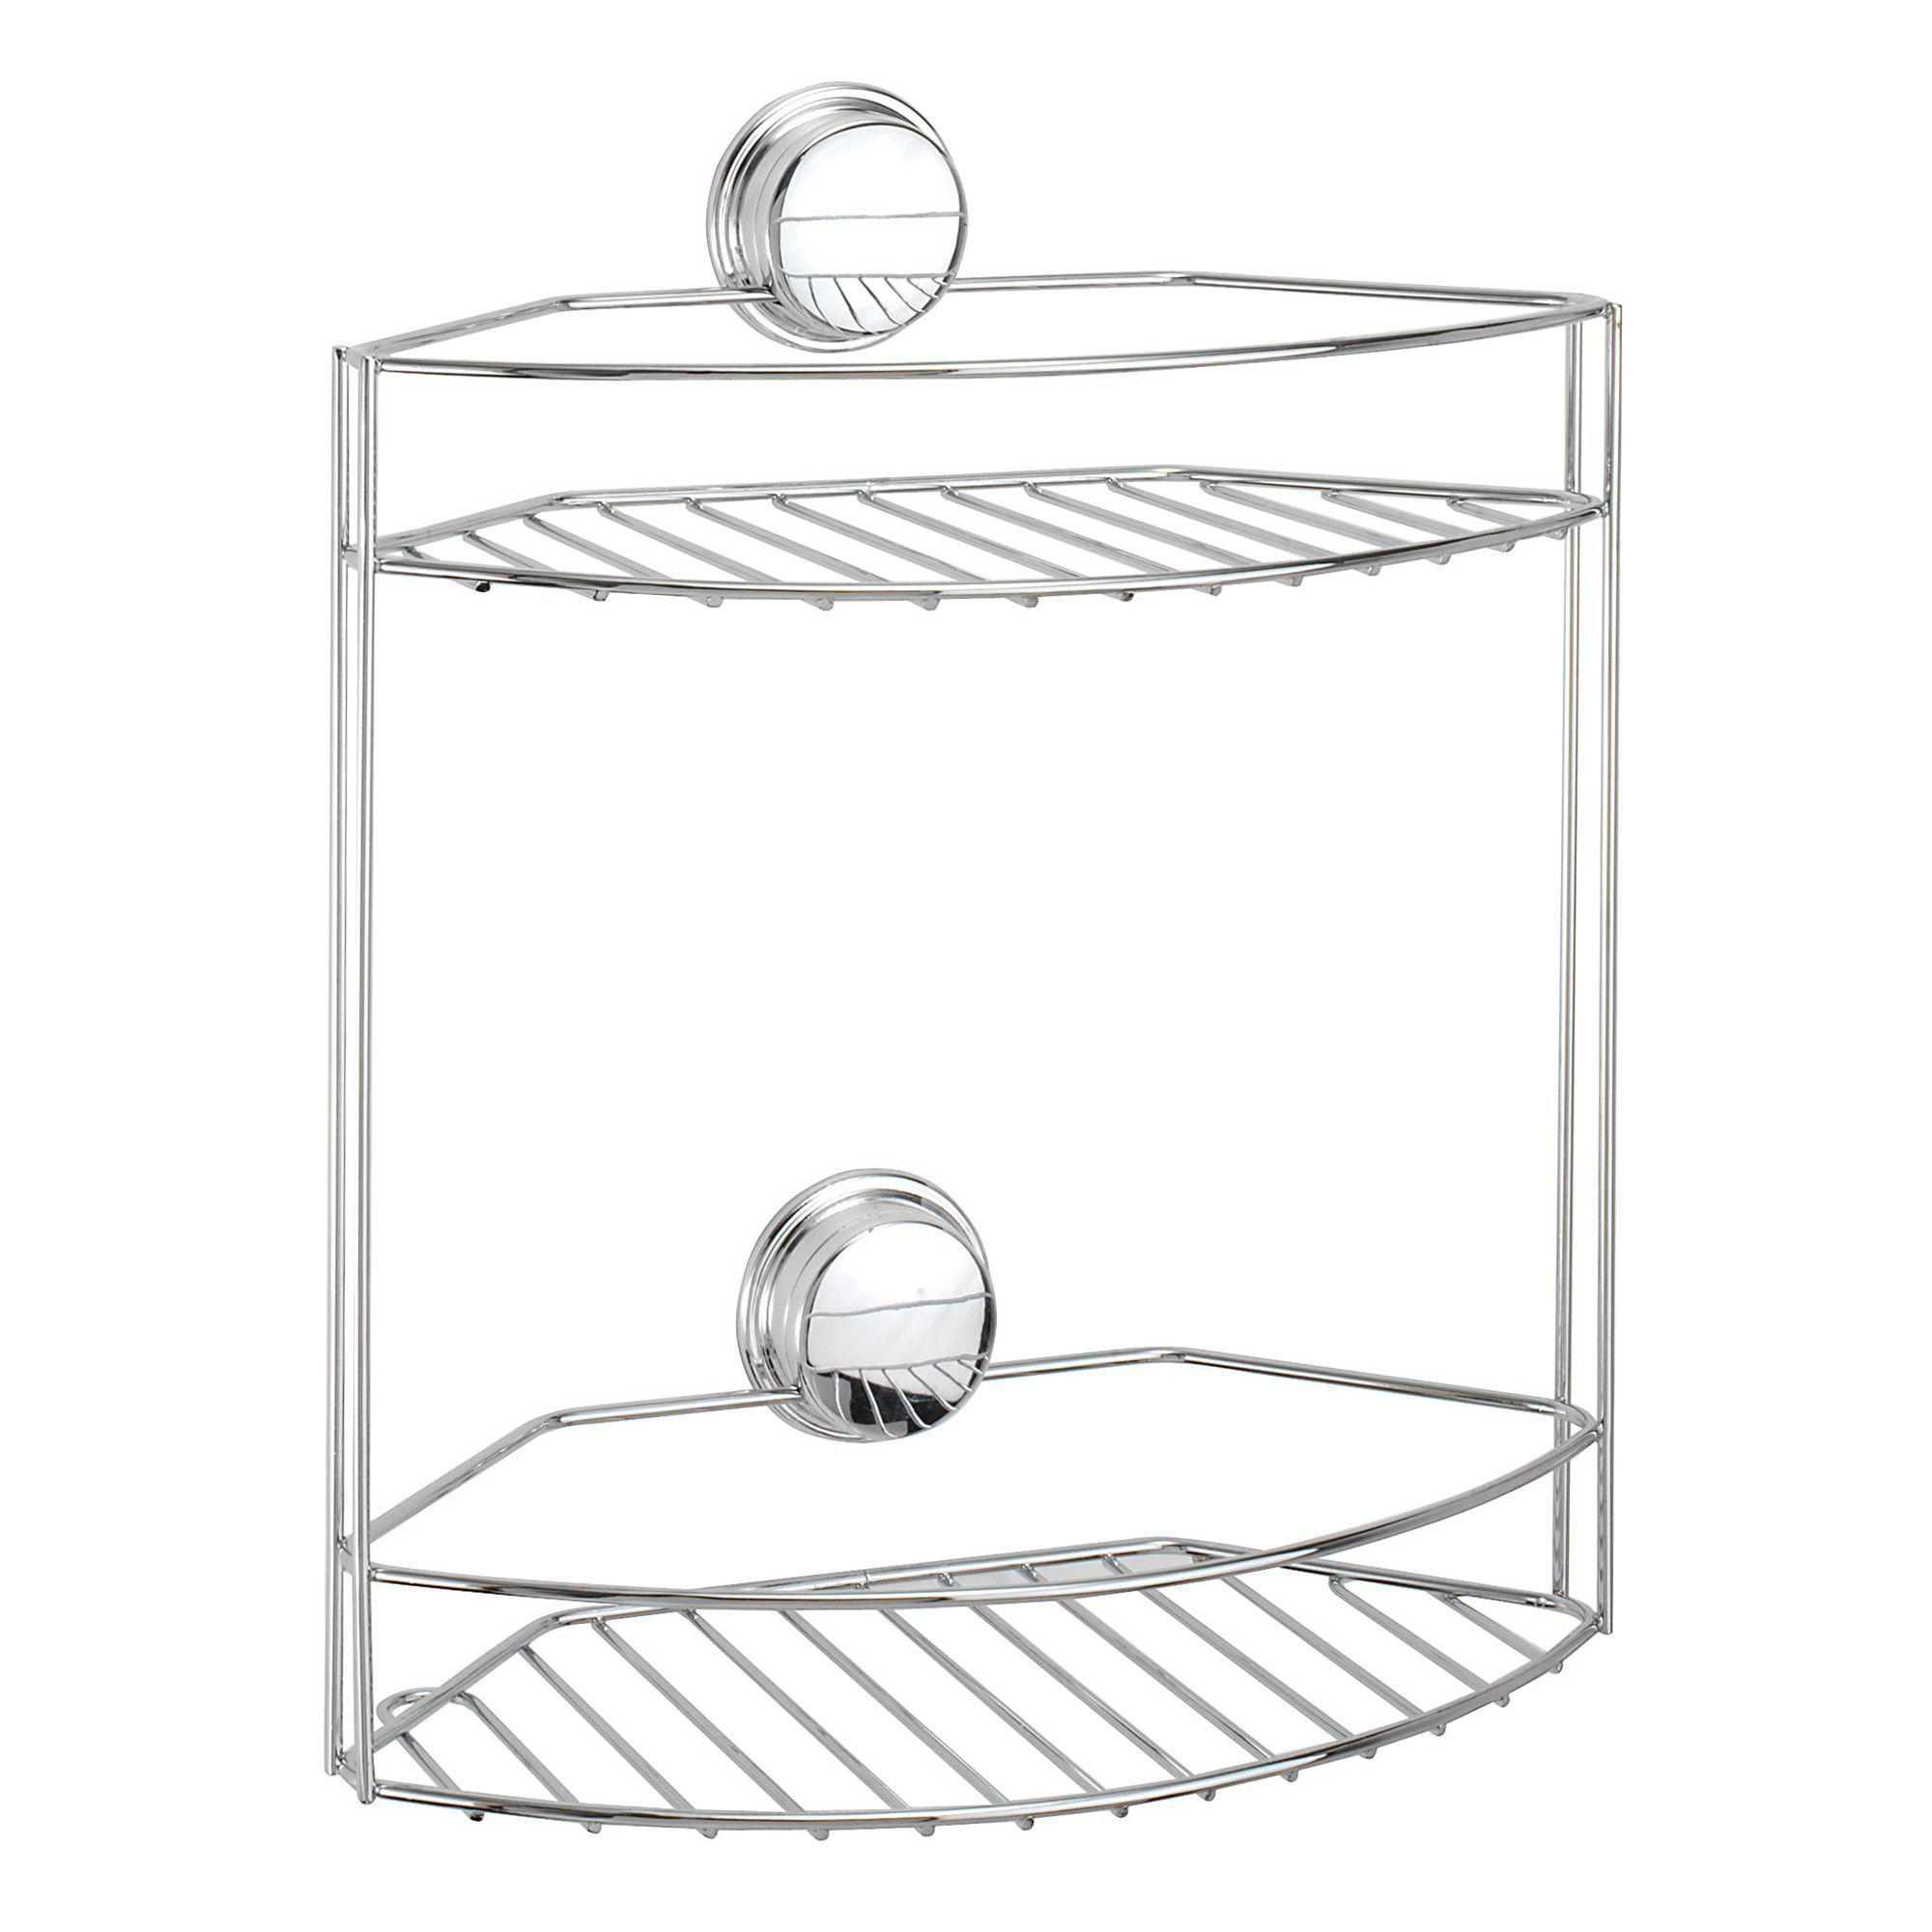 Tier basket shower caddy mild steel rust free stick n lock bathroom - Croydex Stick N Lock Plus Chrome Effect Mild Steel Storage Basket